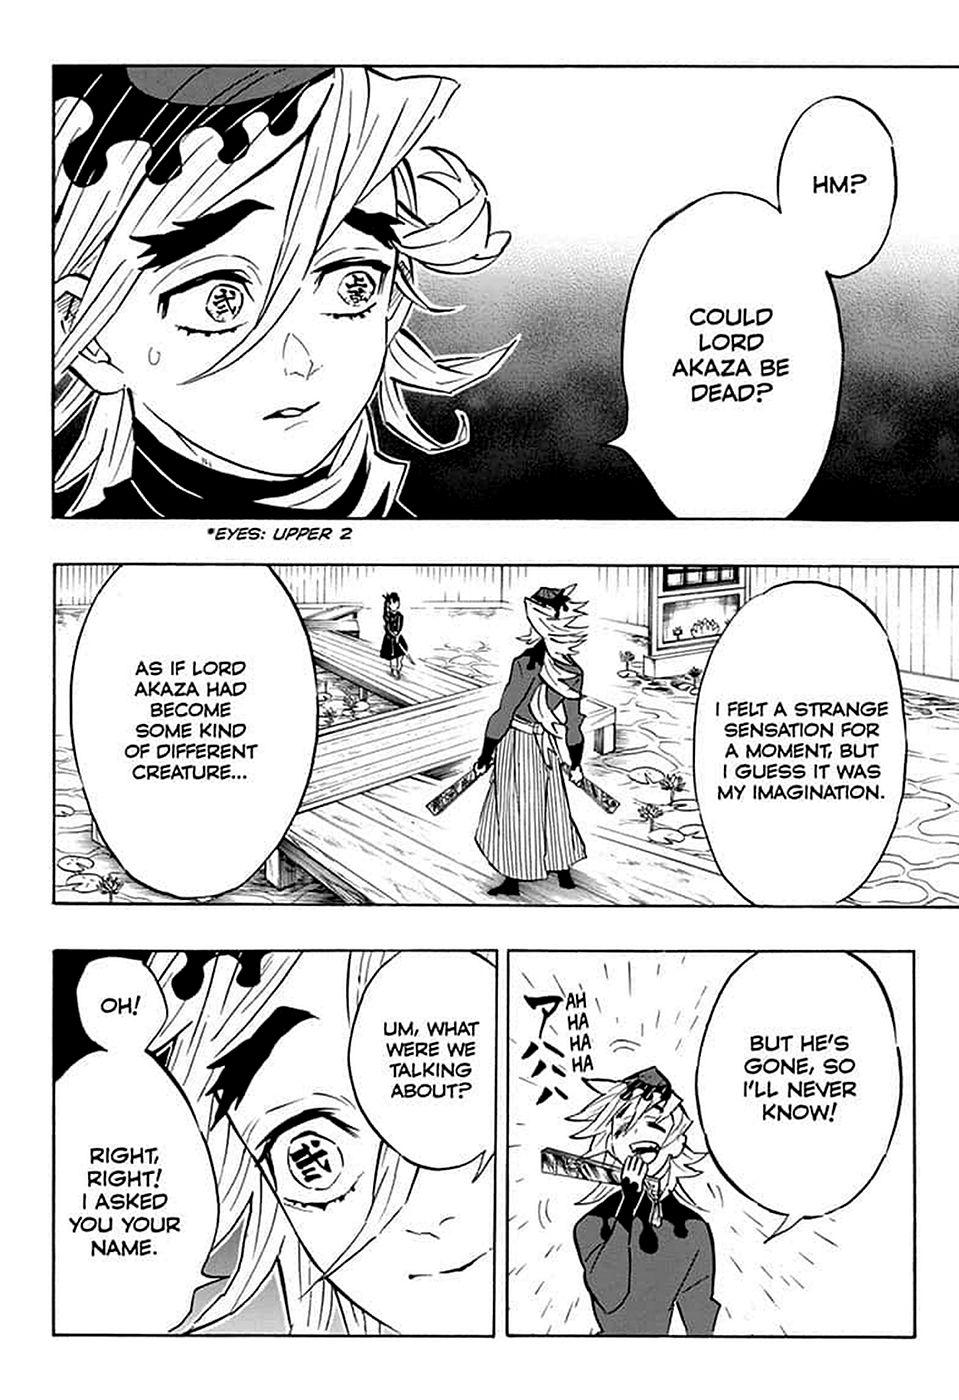 Demon Slayer Kimetsu No Yaiba Chapter 157 Slayer Anime Chapter Manga Online Read